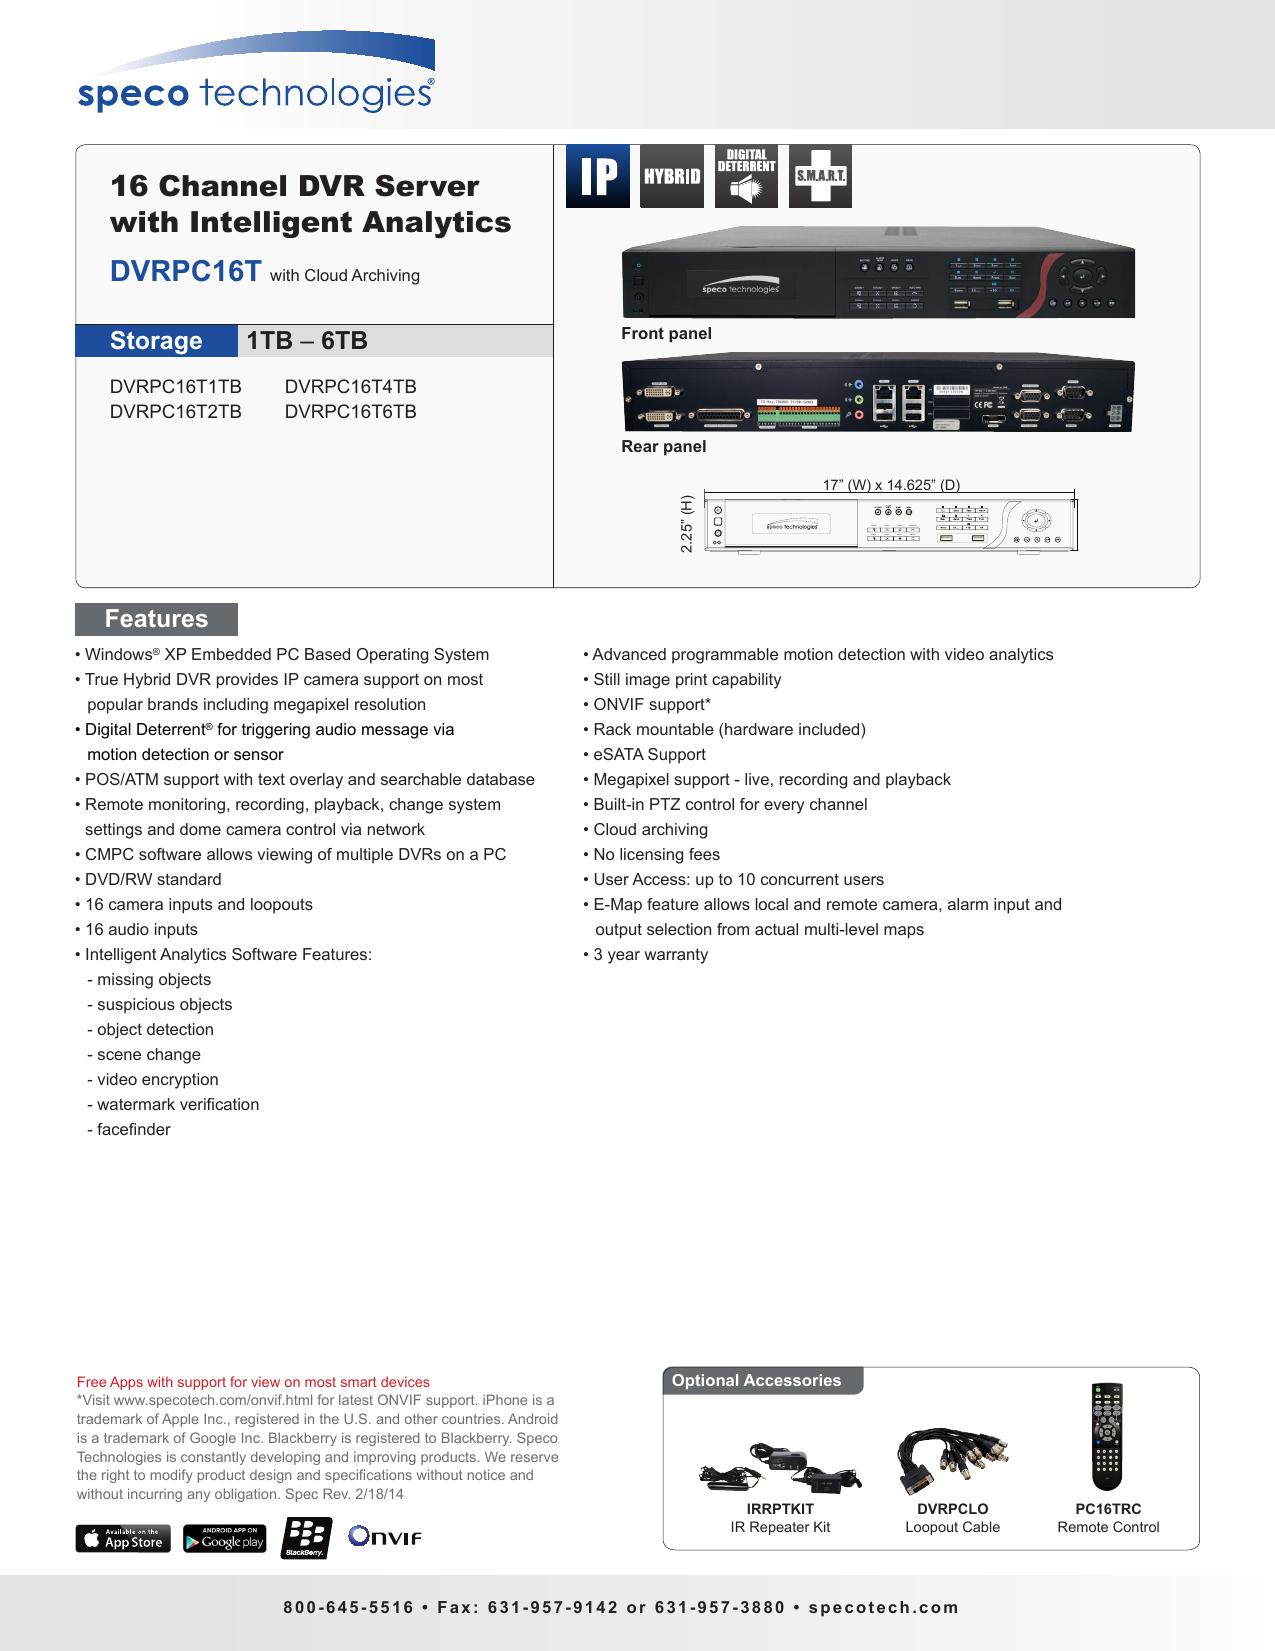 16 Channel DVR Server with Intelligent Analytics   manualzz com